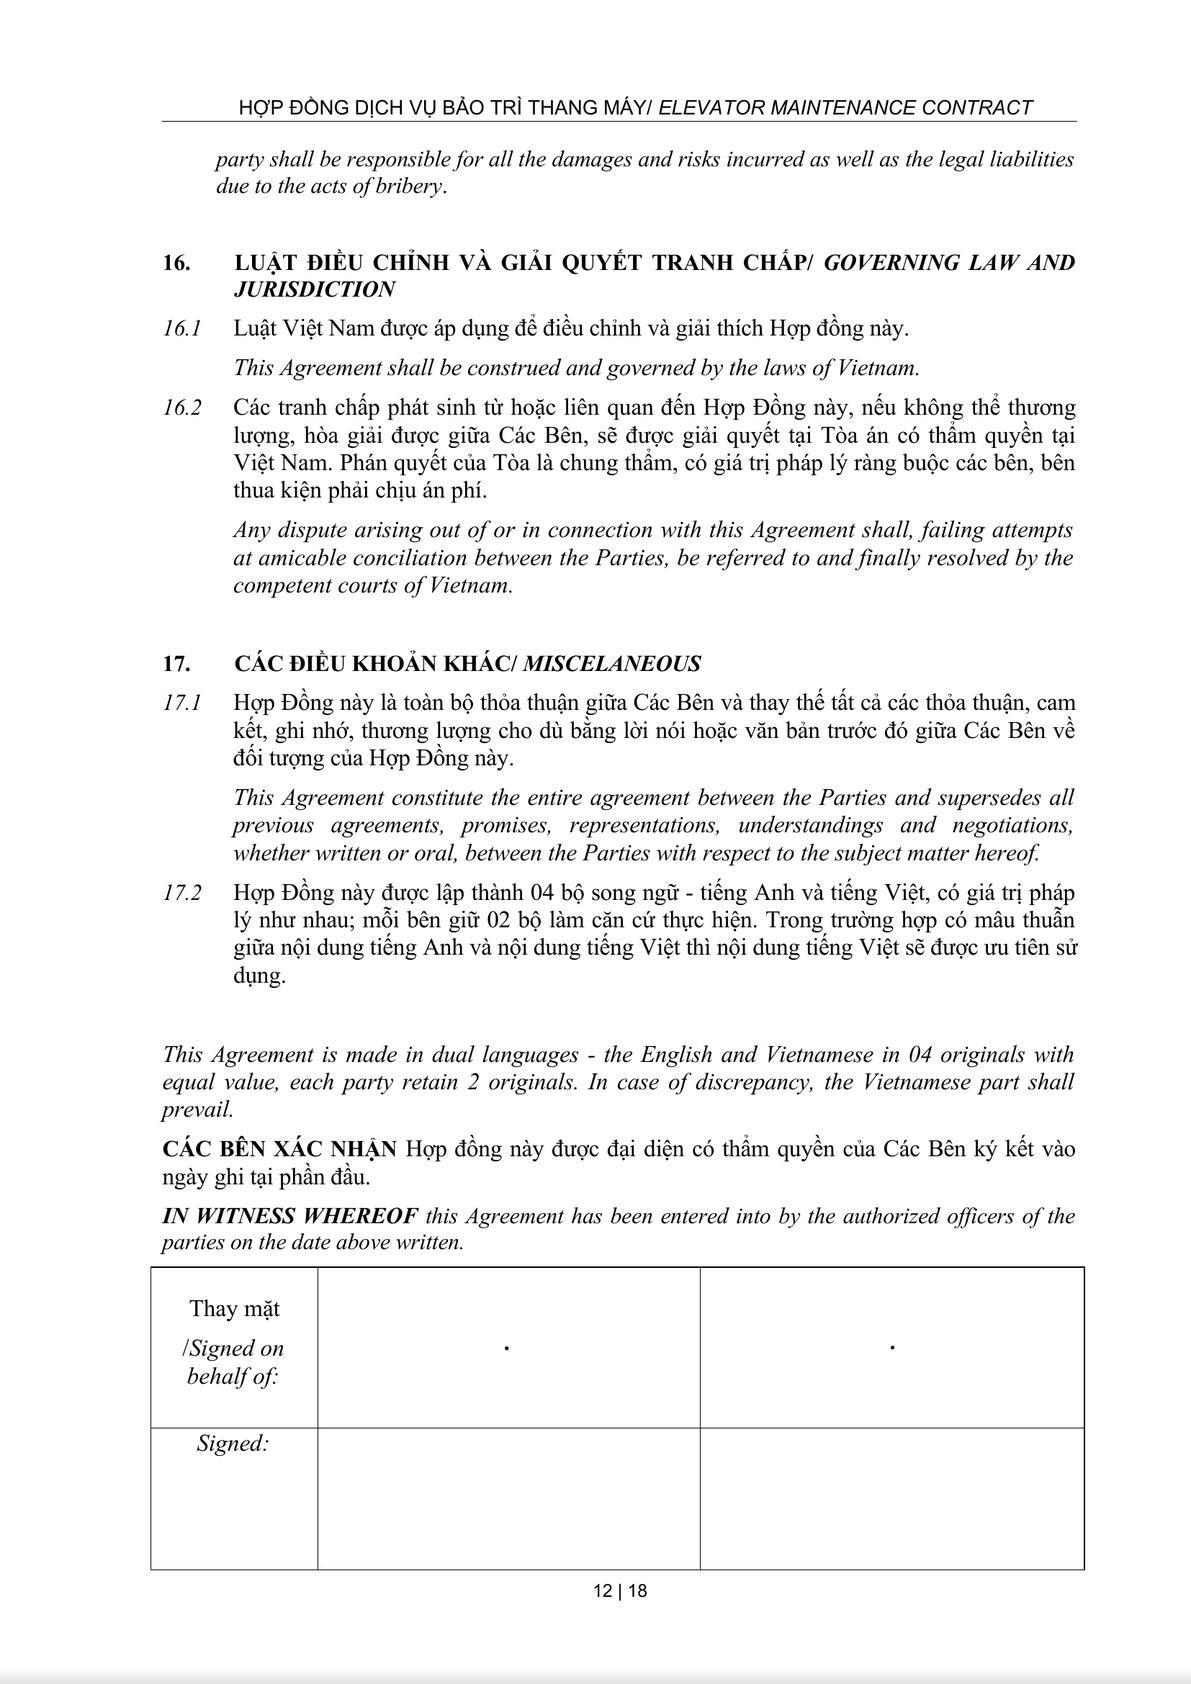 Maintenance Service Agreement-11